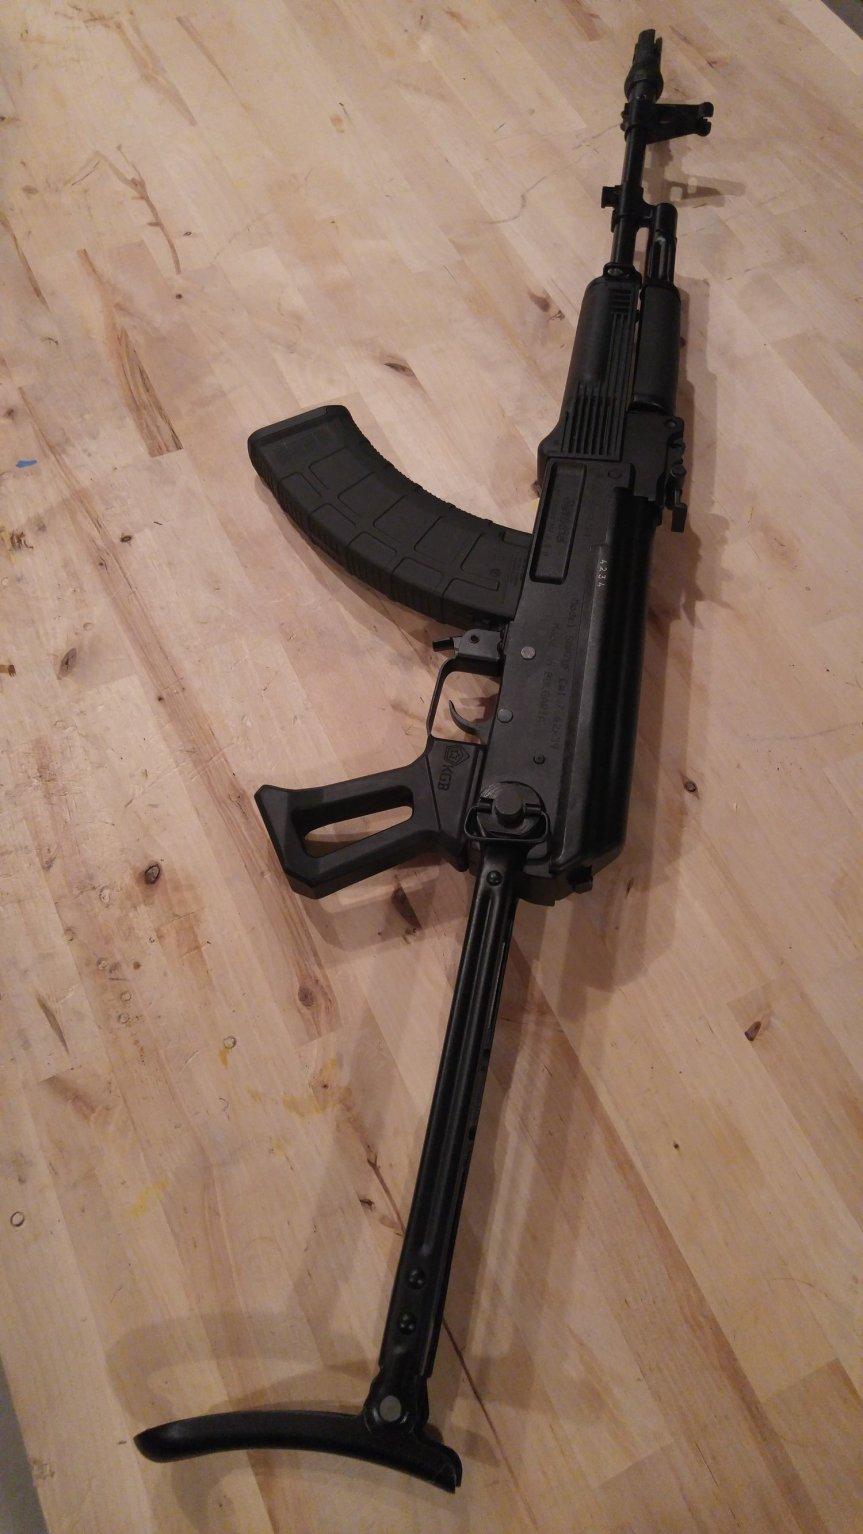 kgb llc ak47 aluminum grip ak74 aluminum grip akm metal grip tactical ak-47 ak-74 gun blog firearmblog attackcopter black rifle russian 2